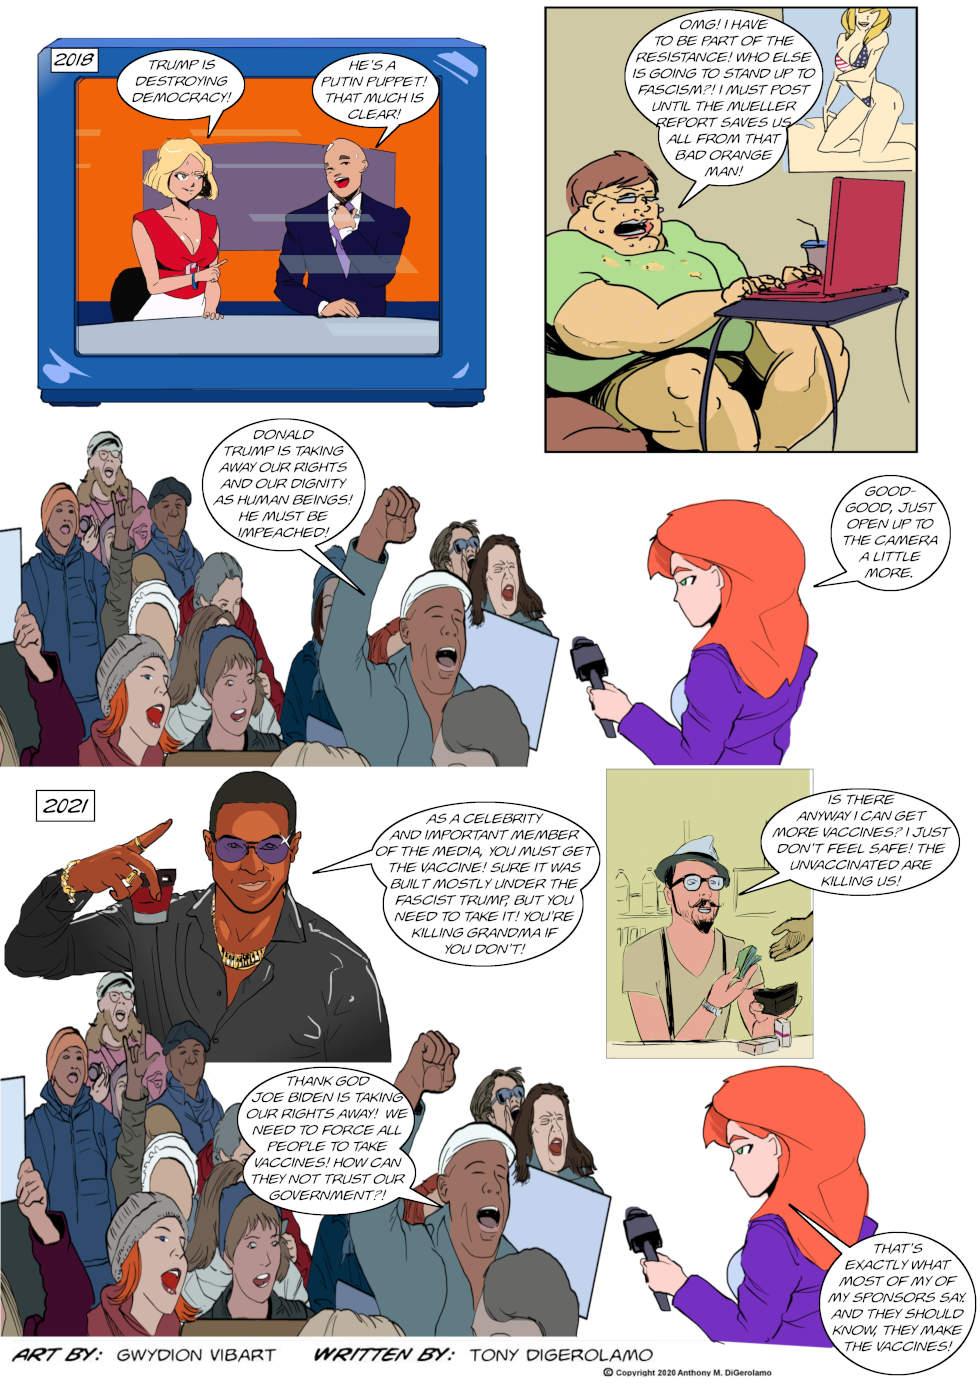 The Antiwar Comic: Rinse and Repeat